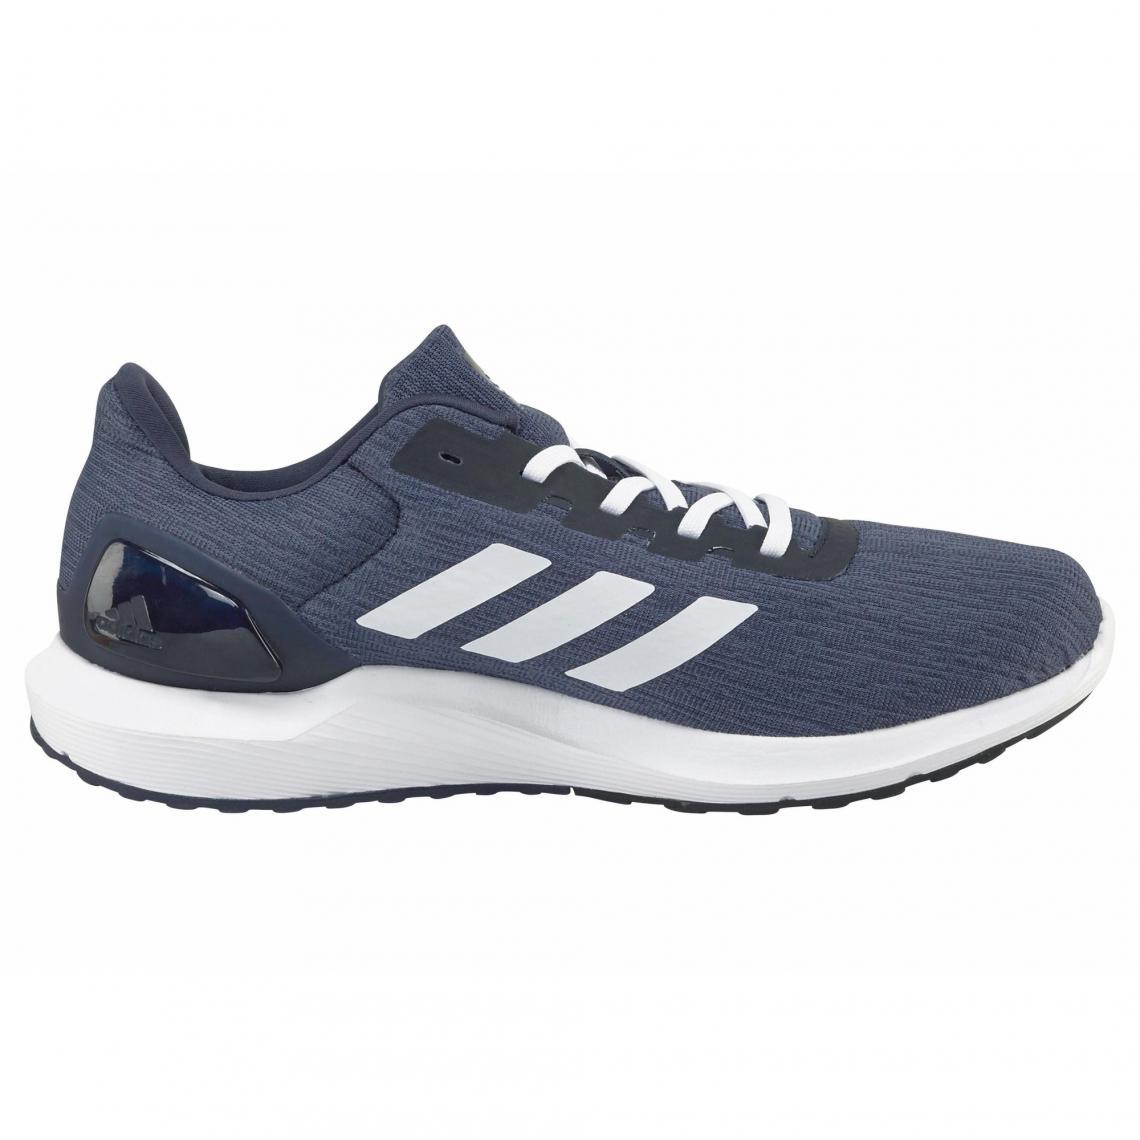 quality design 3c8f3 9d2cf Toutes les chaussures Adidas Performance